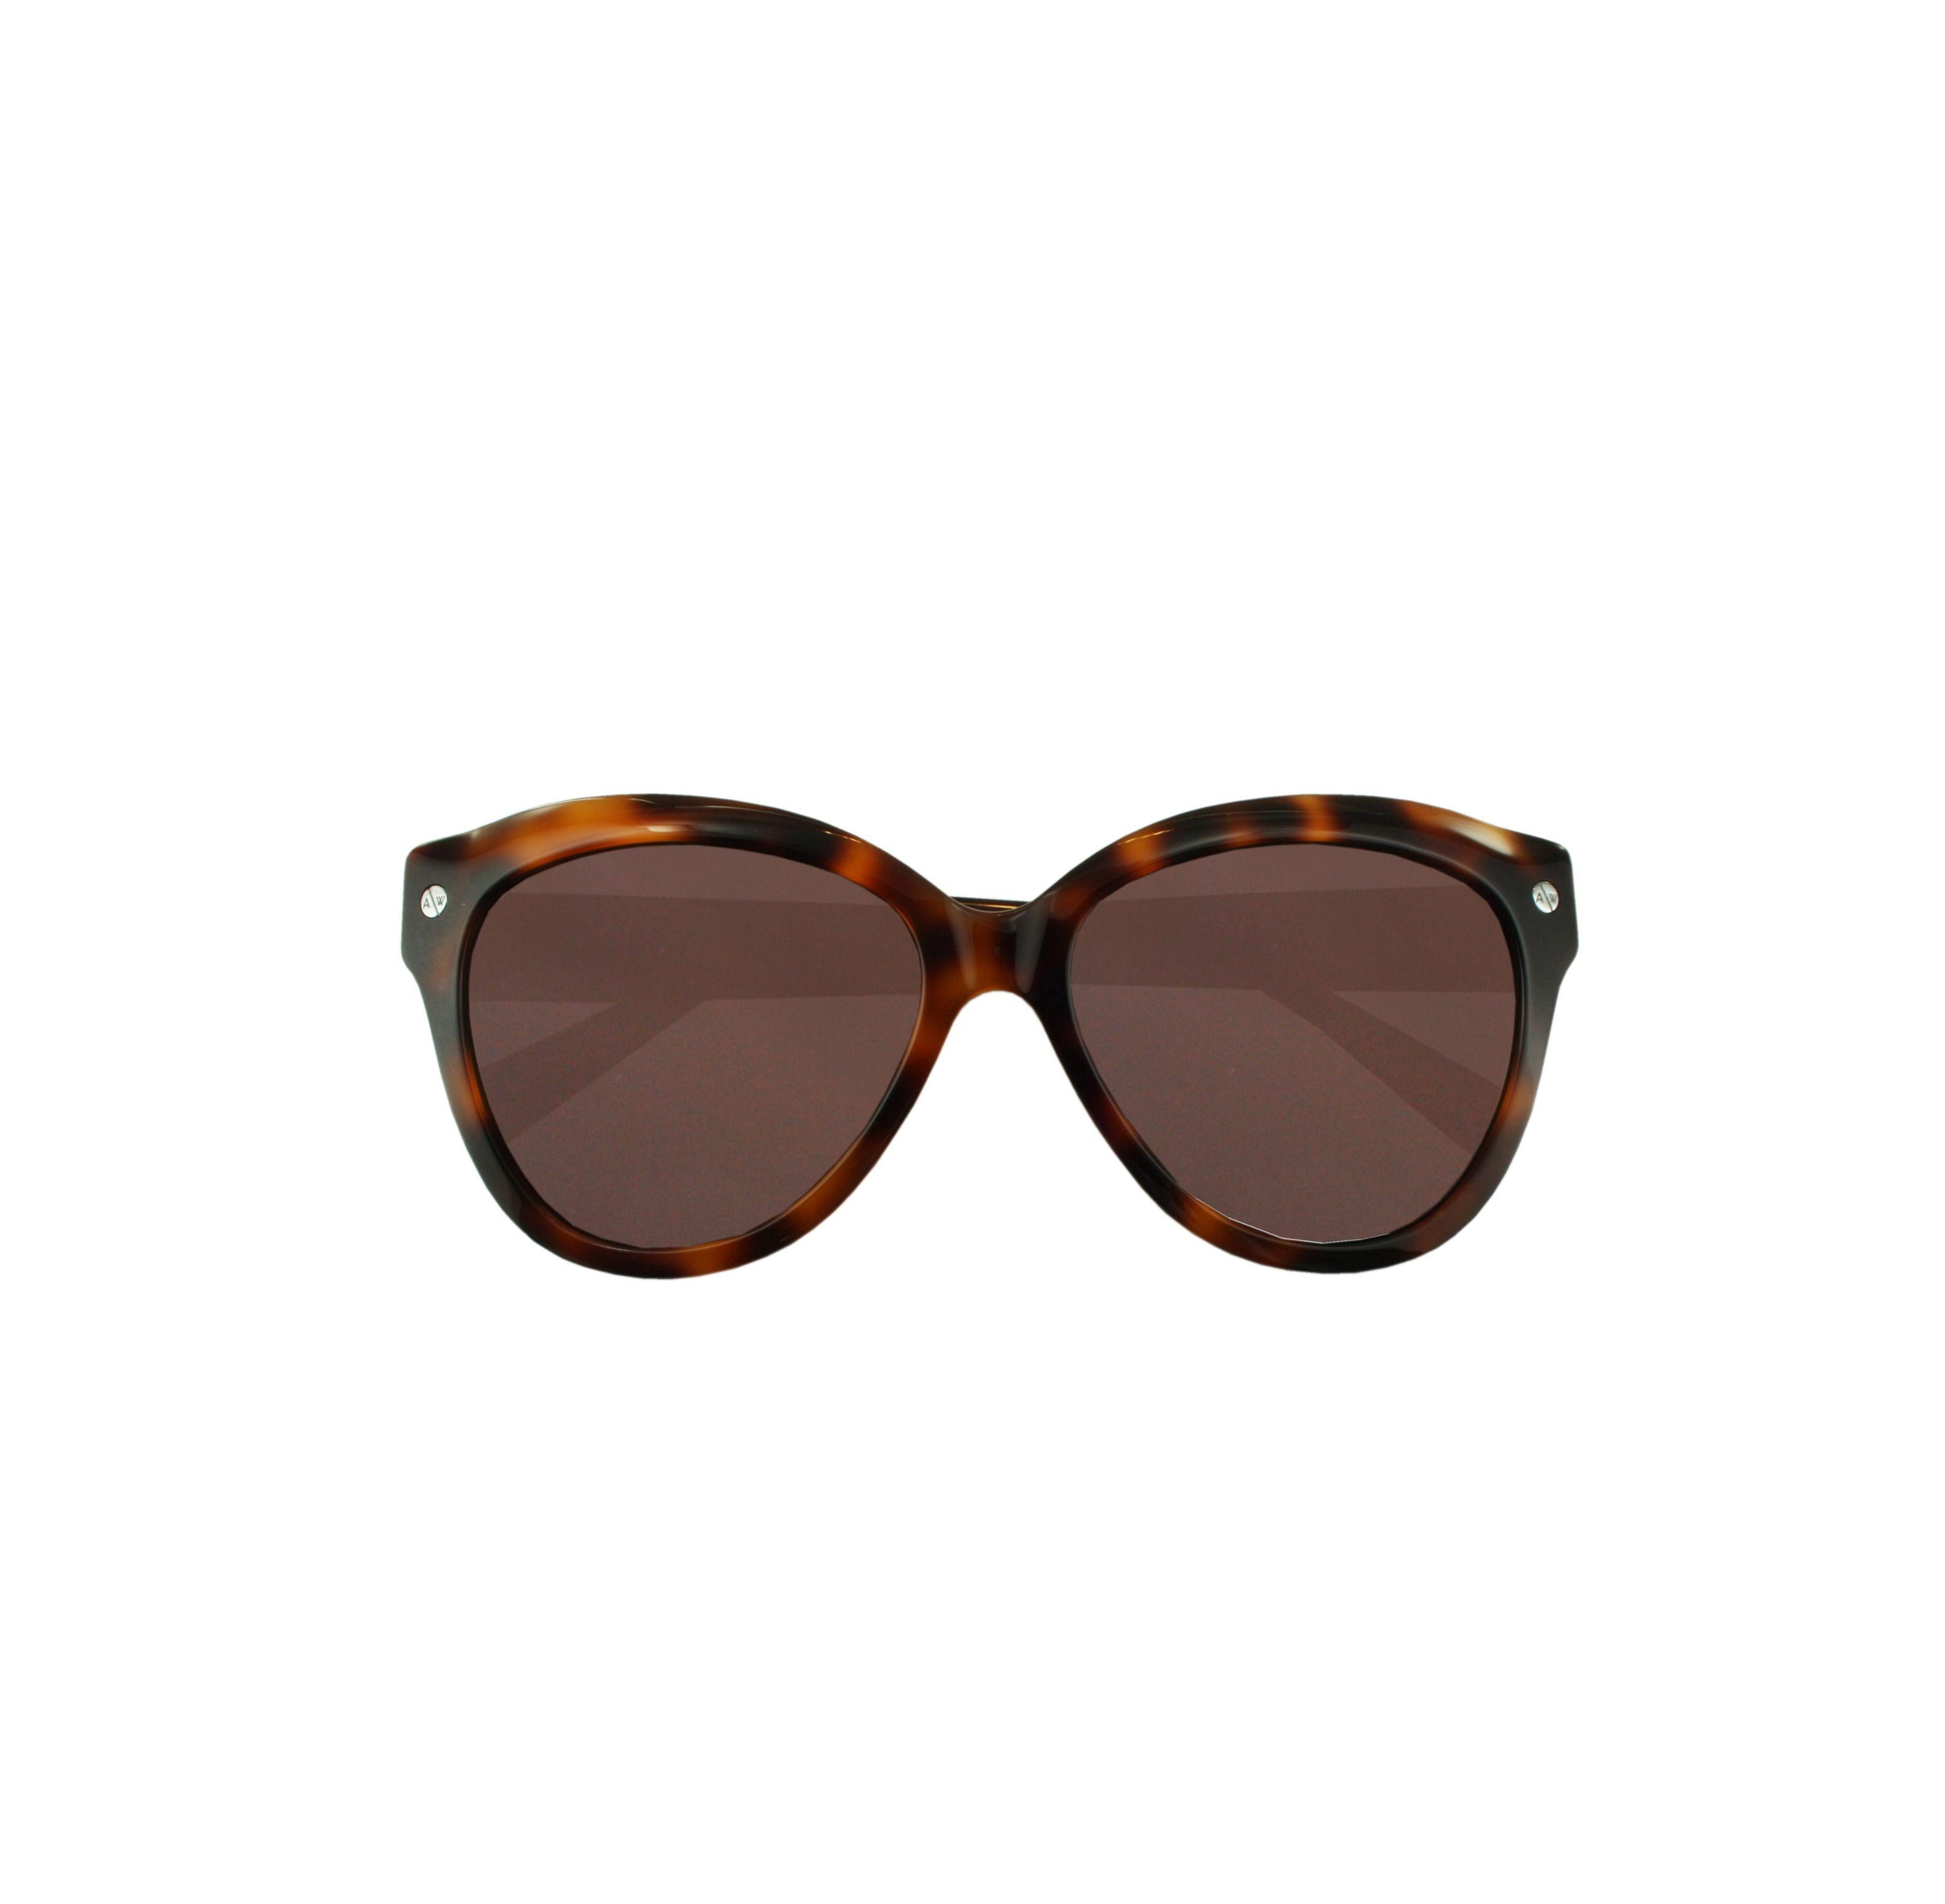 794db53060 Amanda Wakeley. Women s Brown The Chelsea Tortoiseshell Sunglasses.  166  From Orchard Mile